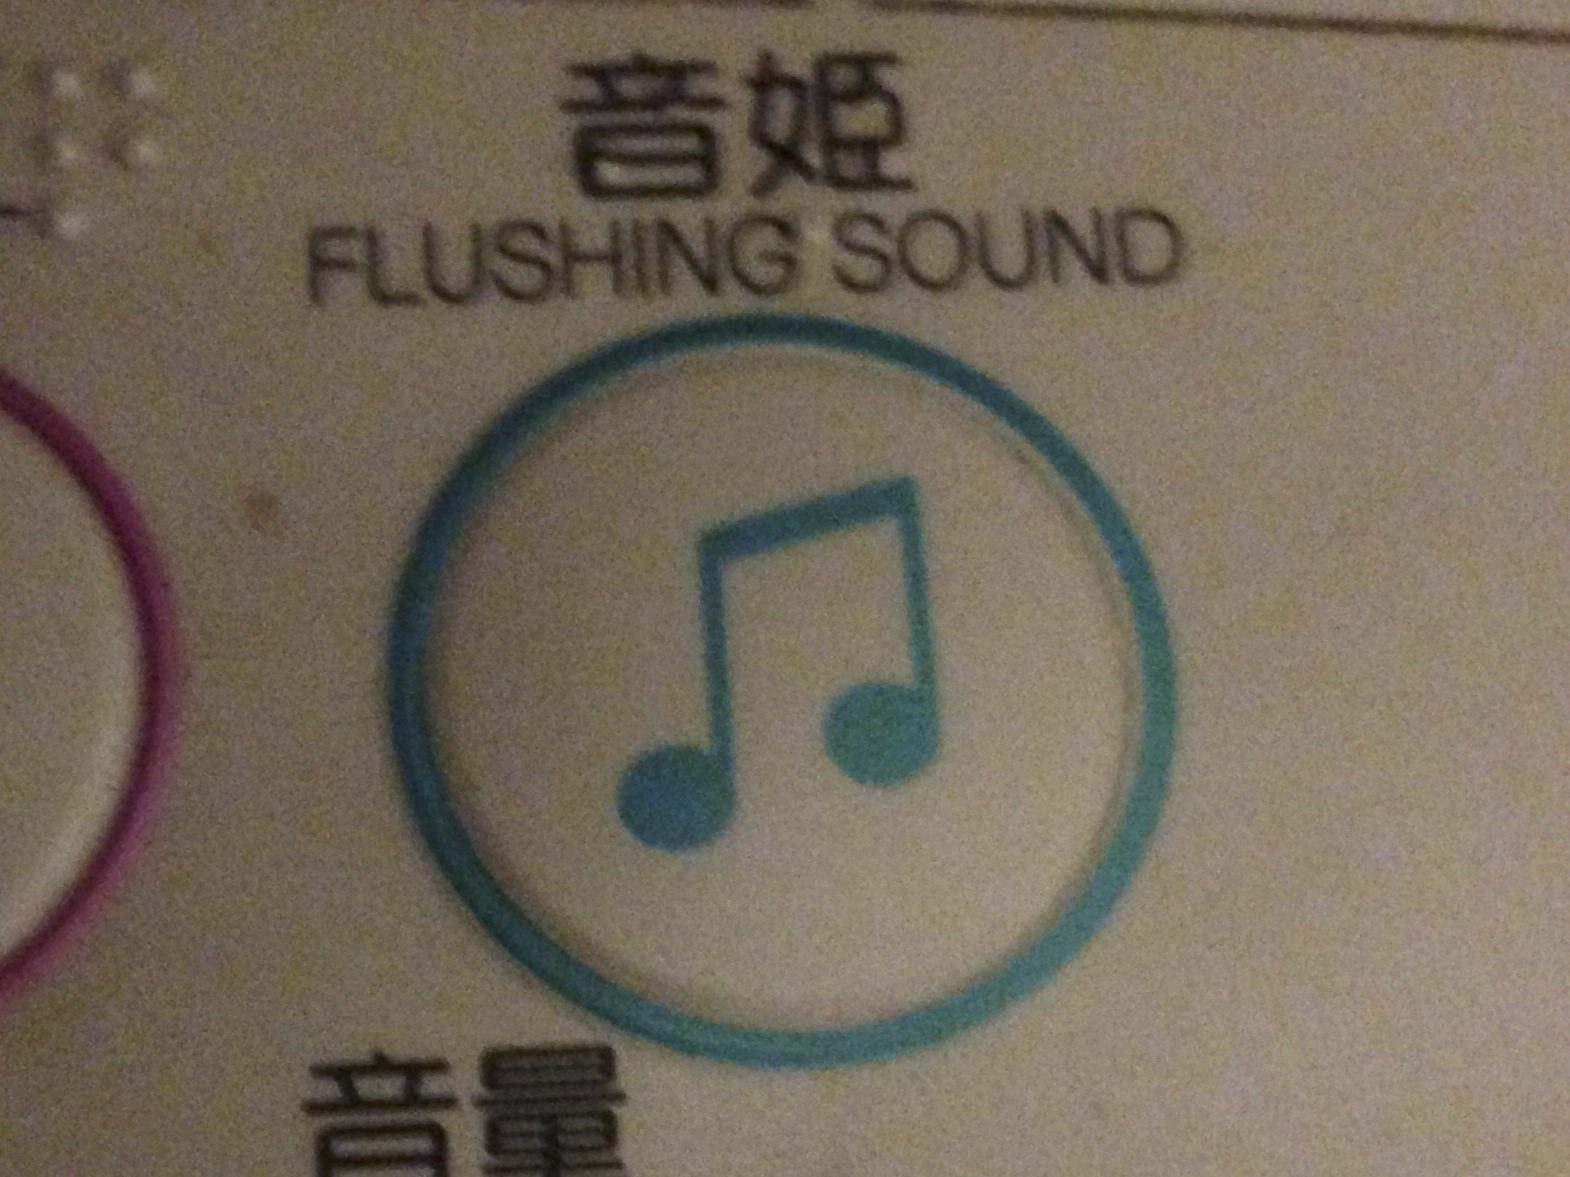 Flushing sound button